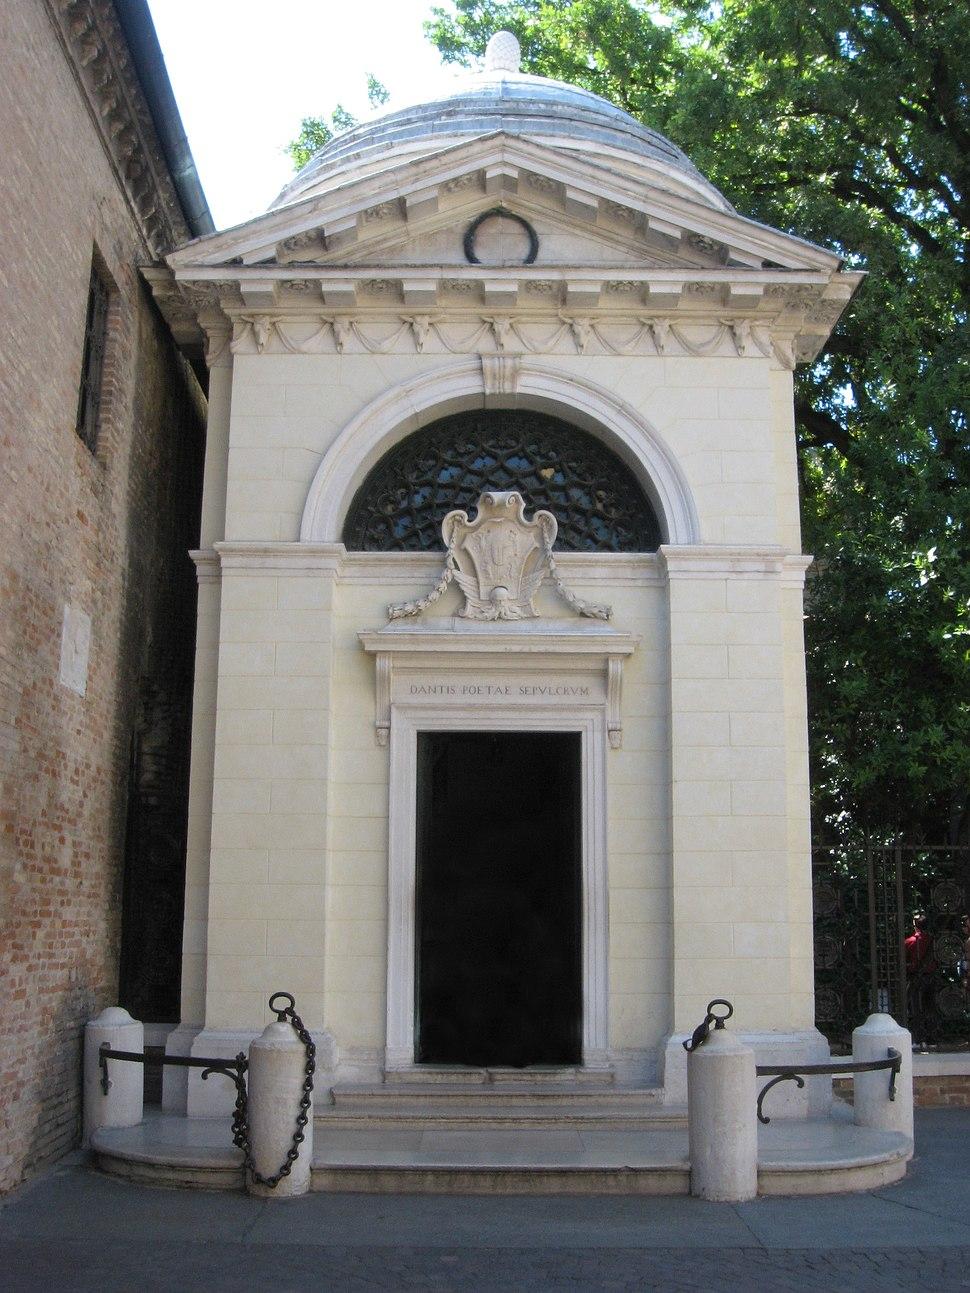 Dantes tomb ravenna